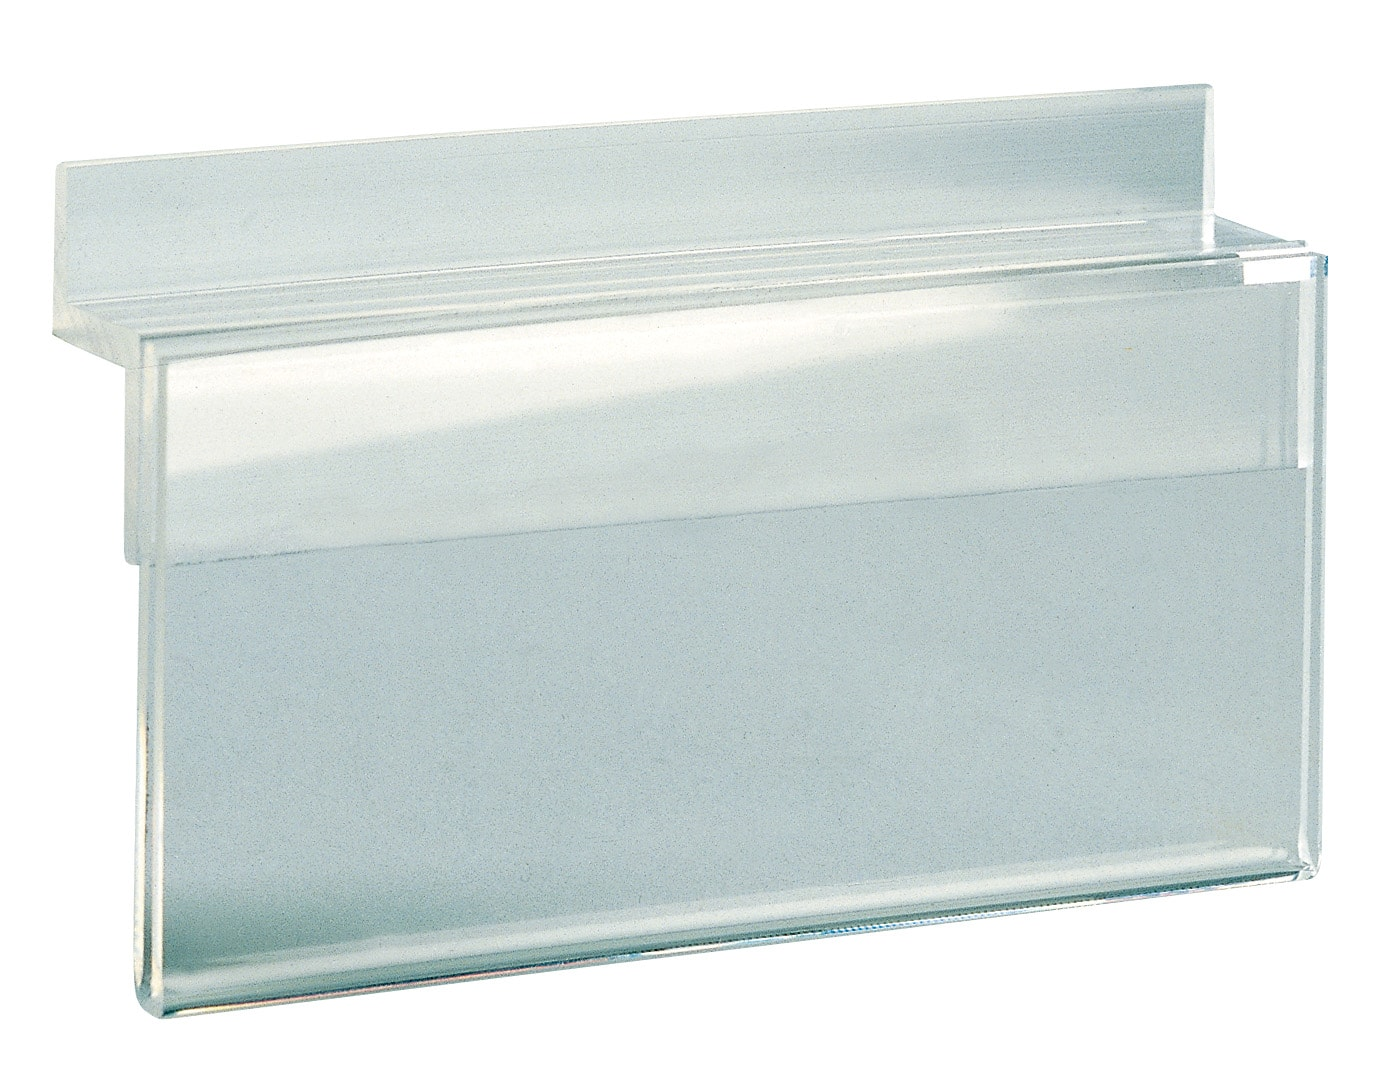 KM44385 - Price tag holder